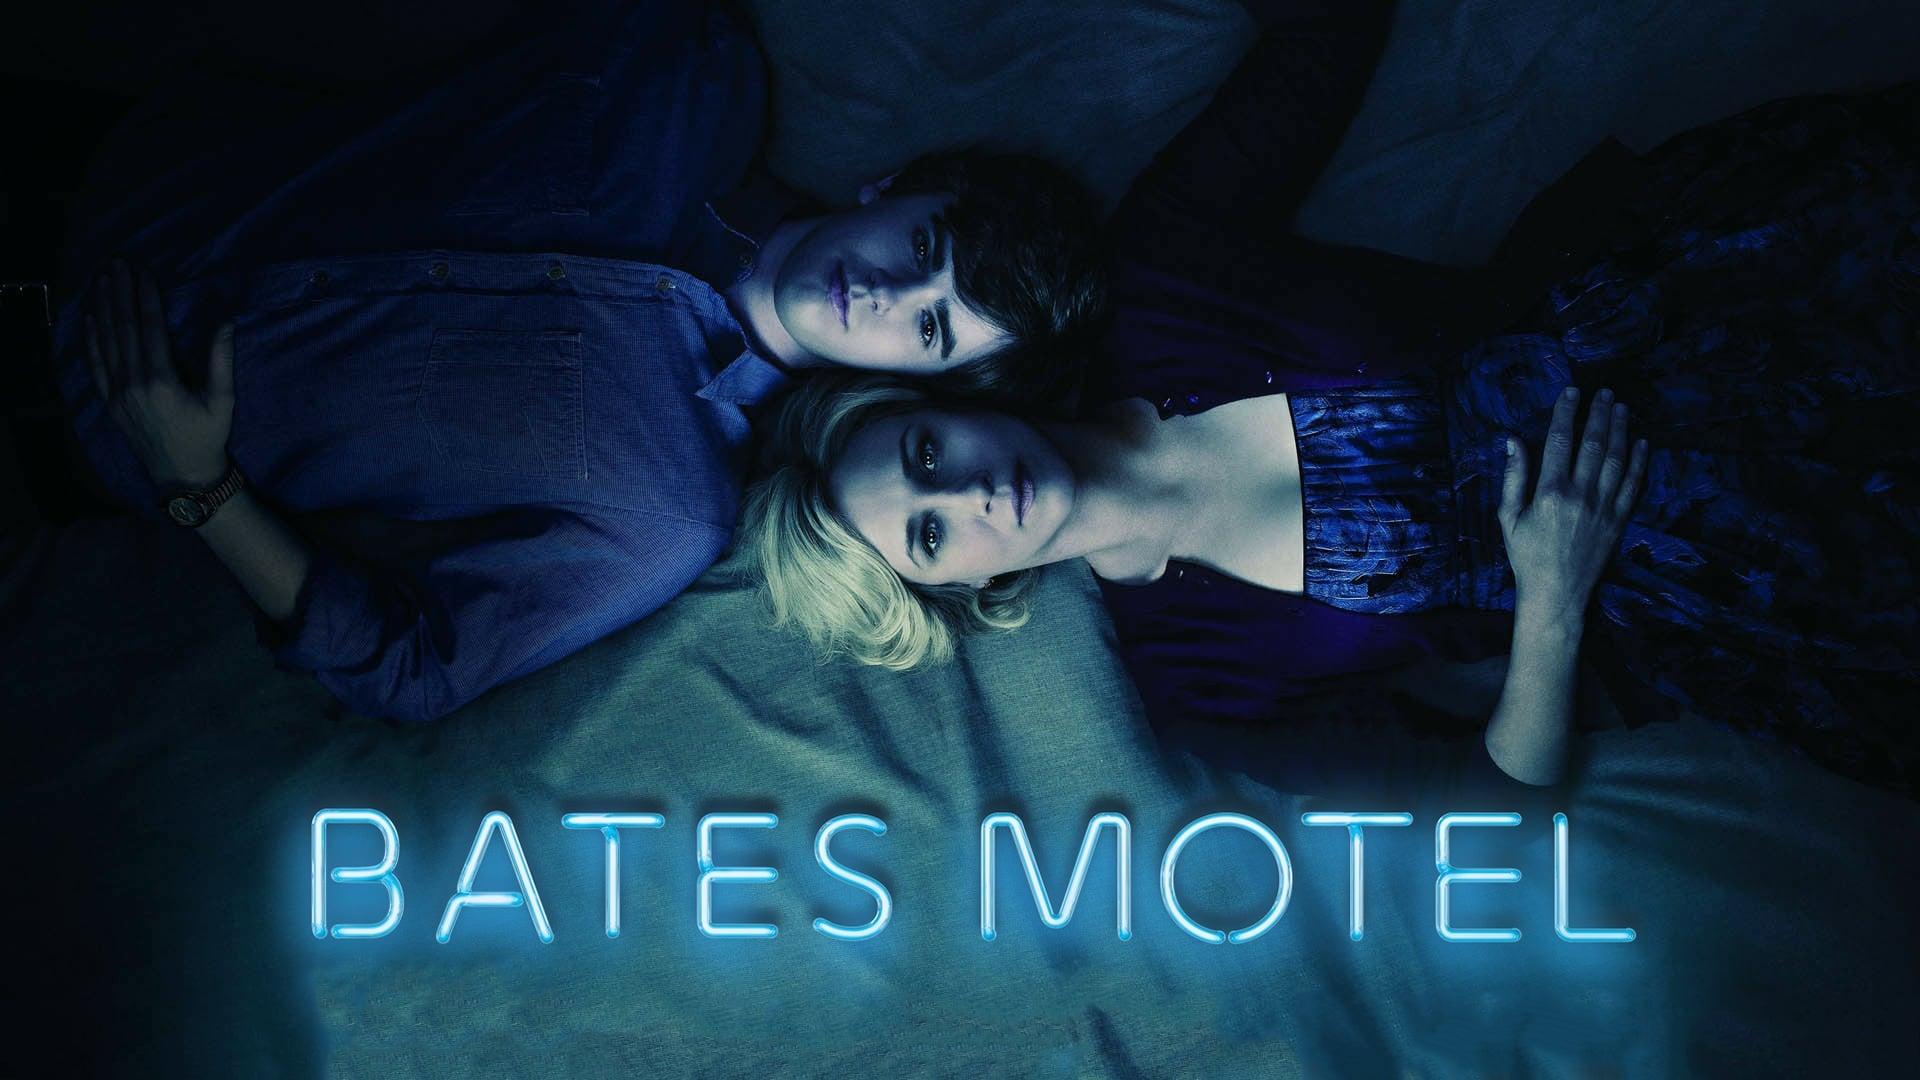 Bates Motel